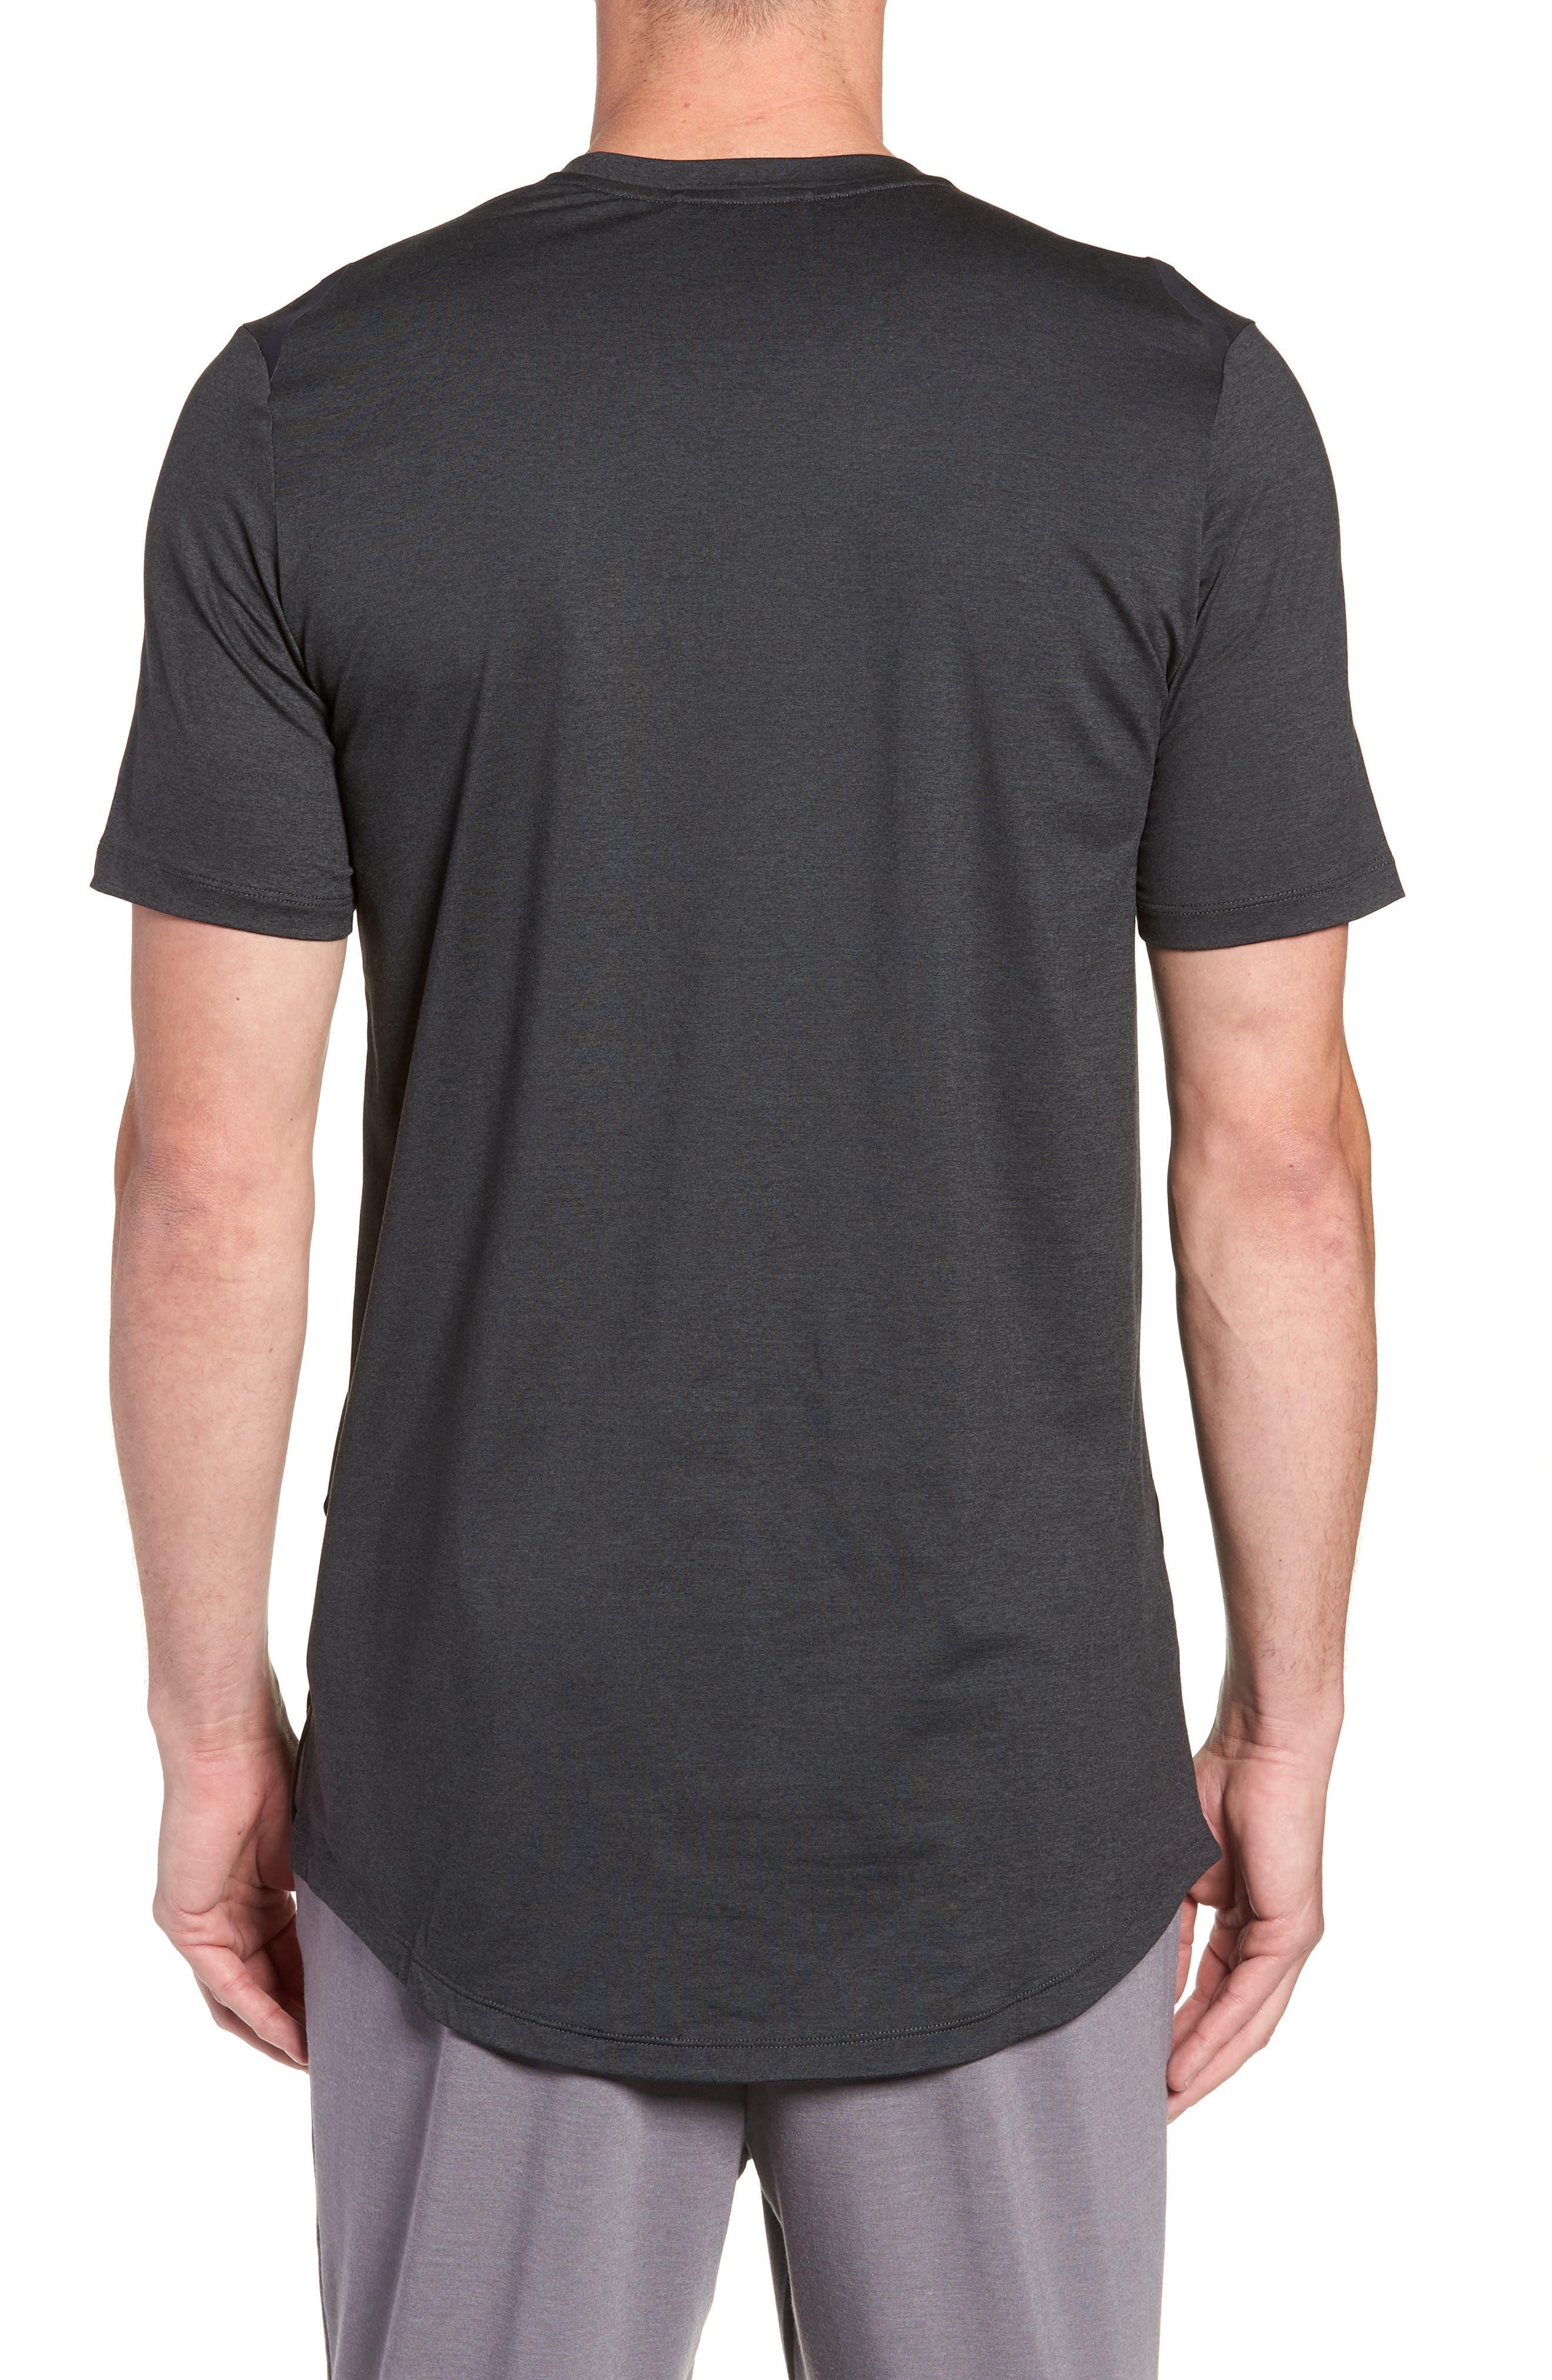 Dry Max Training T-Shirt,                             Alternate thumbnail 2, color,                             BLACK/ ANTHRACITE/ COBALT